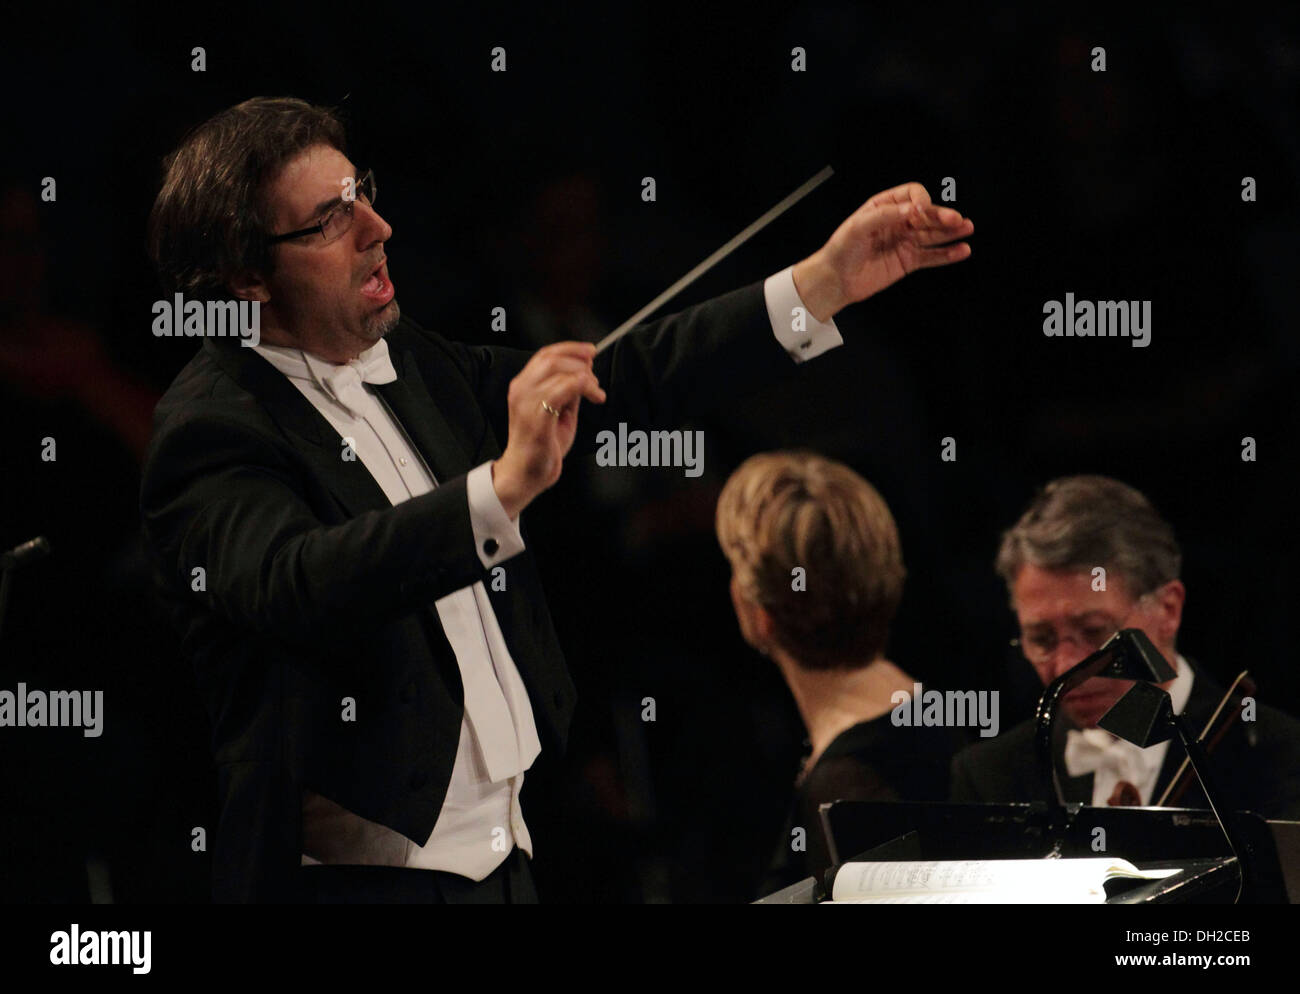 Daniel Raiskin, Chief Conductor of the Rhenish Philharmonic State Orchestra, Koblenz, Rhineland-Palatinate - Stock Image